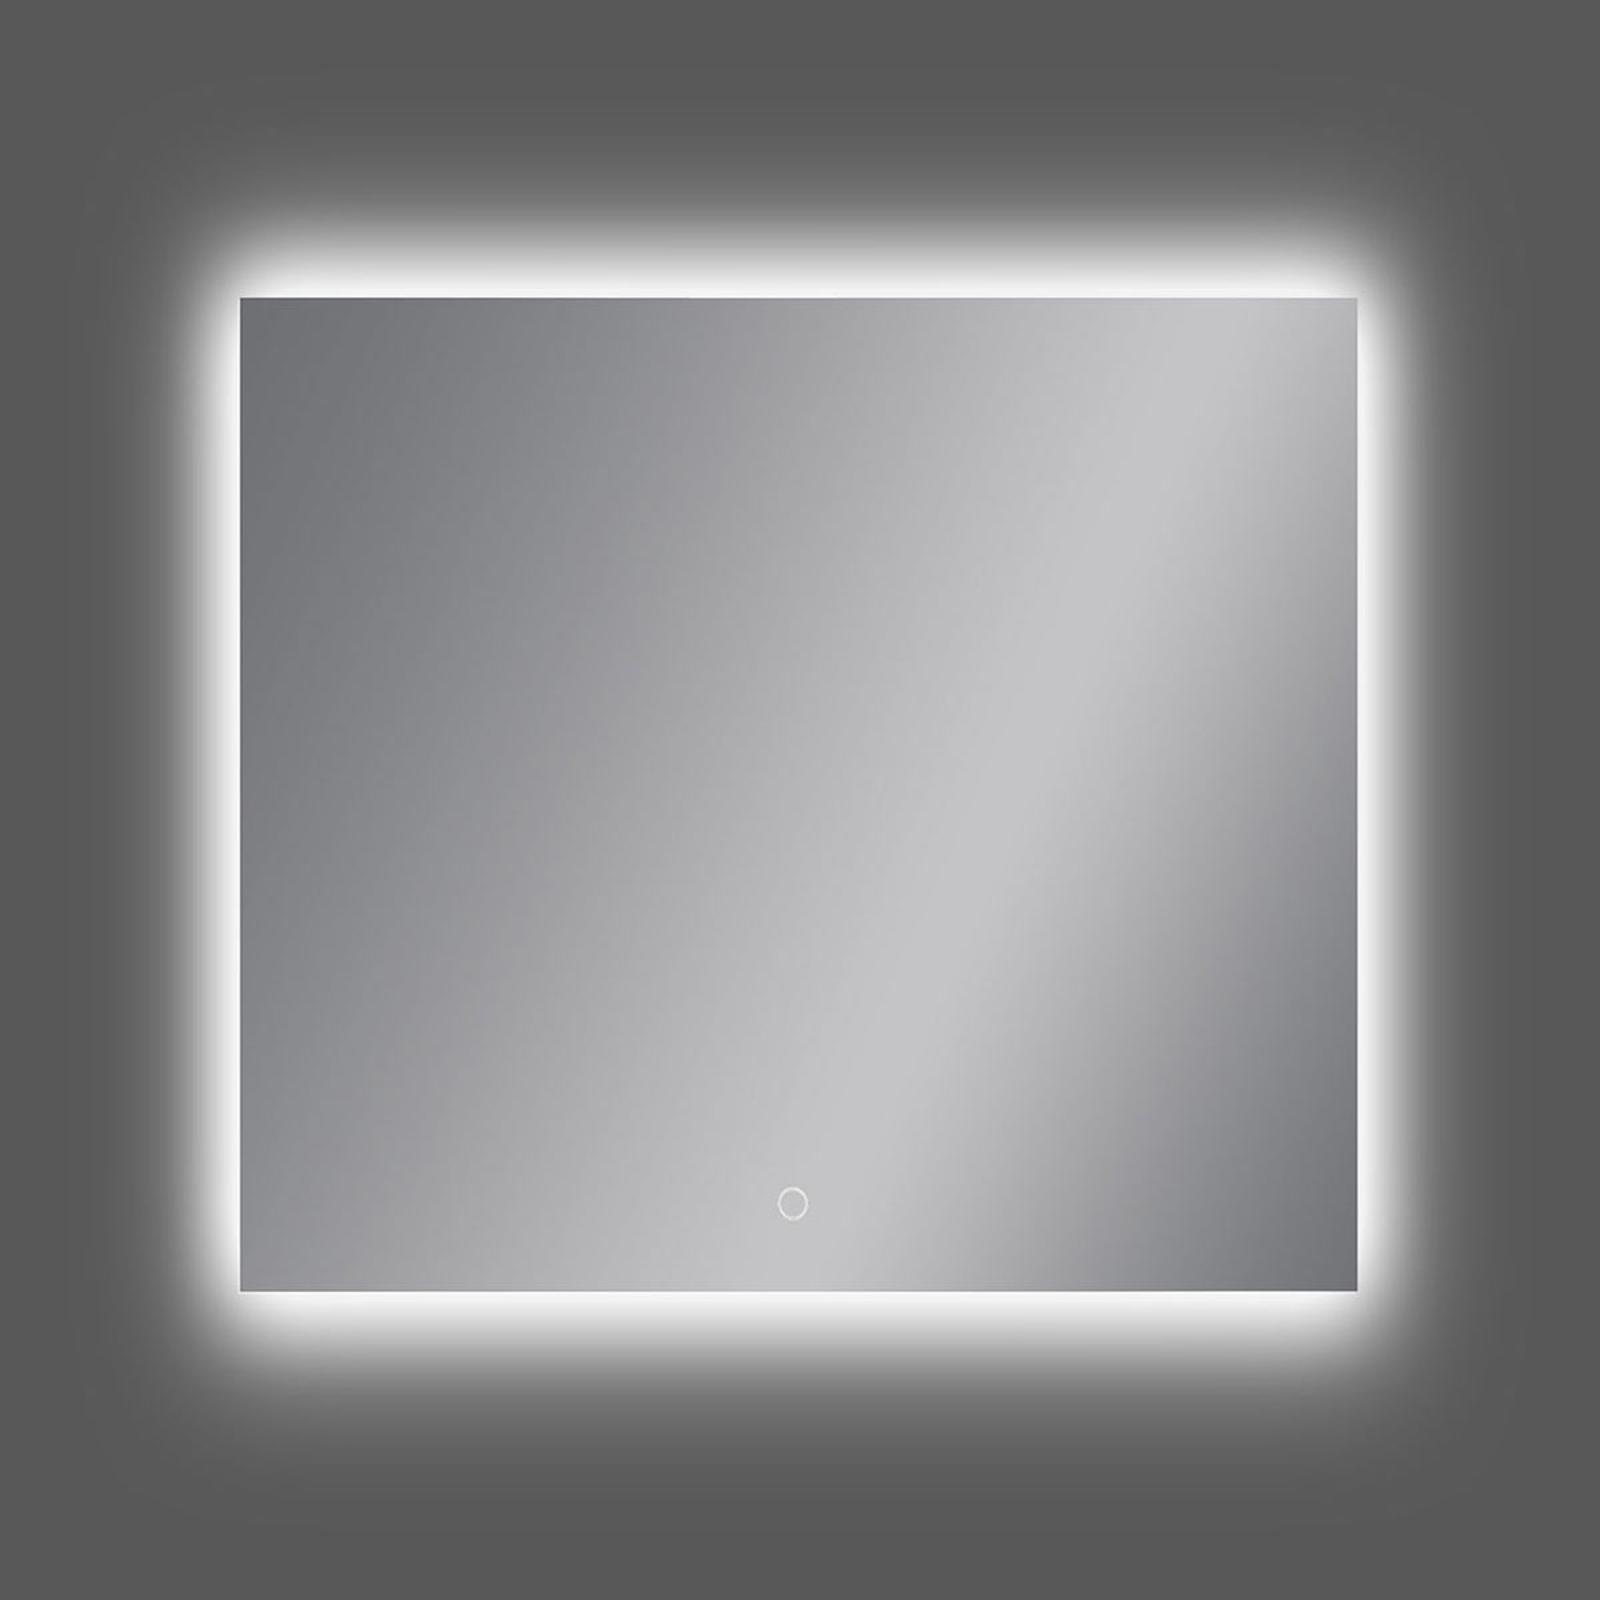 Miroir mural LED Estela, 75x80cm, 3000K